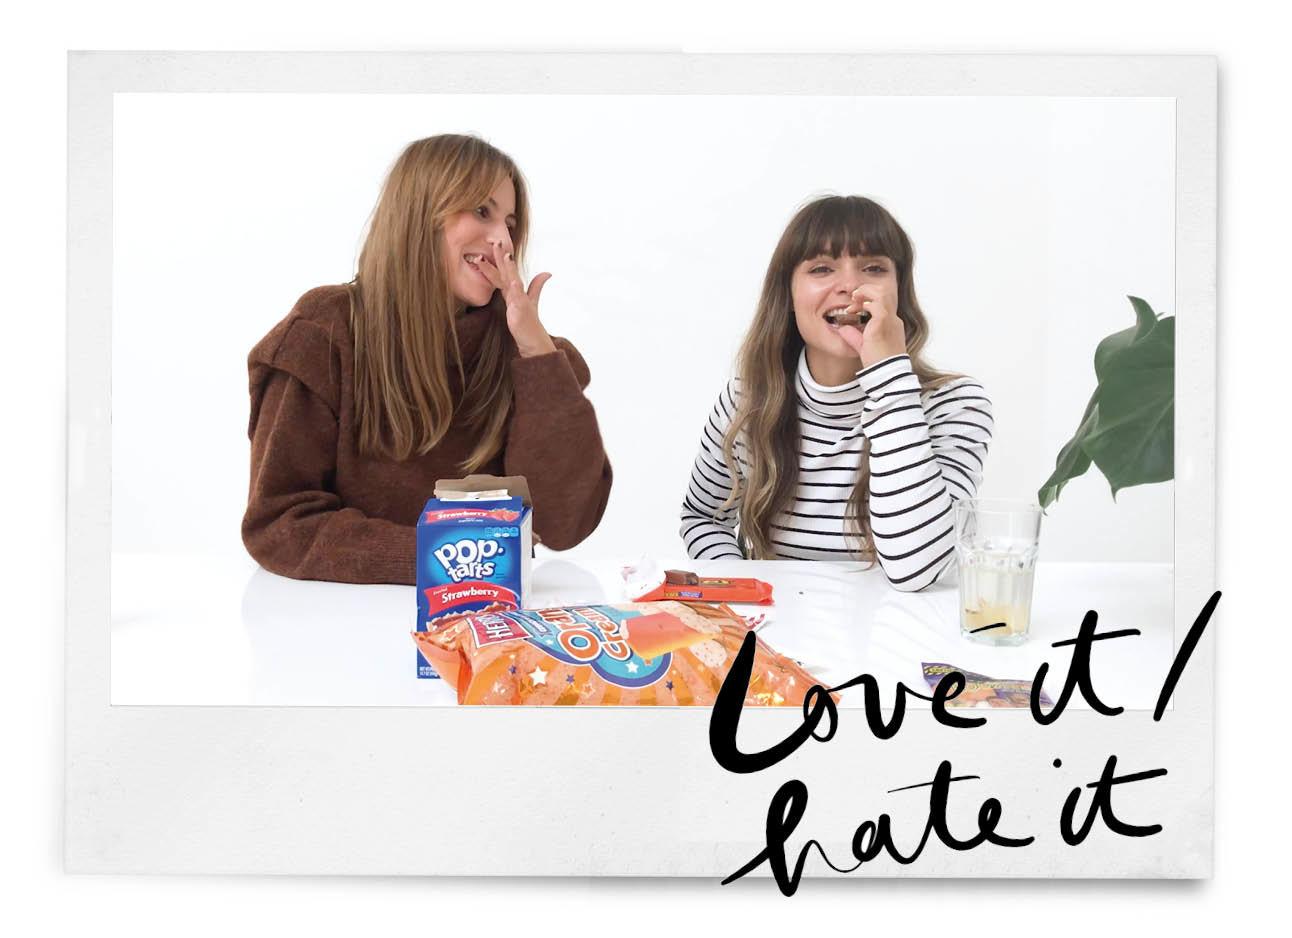 Kiki en lil die lachend aan tafel zitten met om zih geen zakken snoep